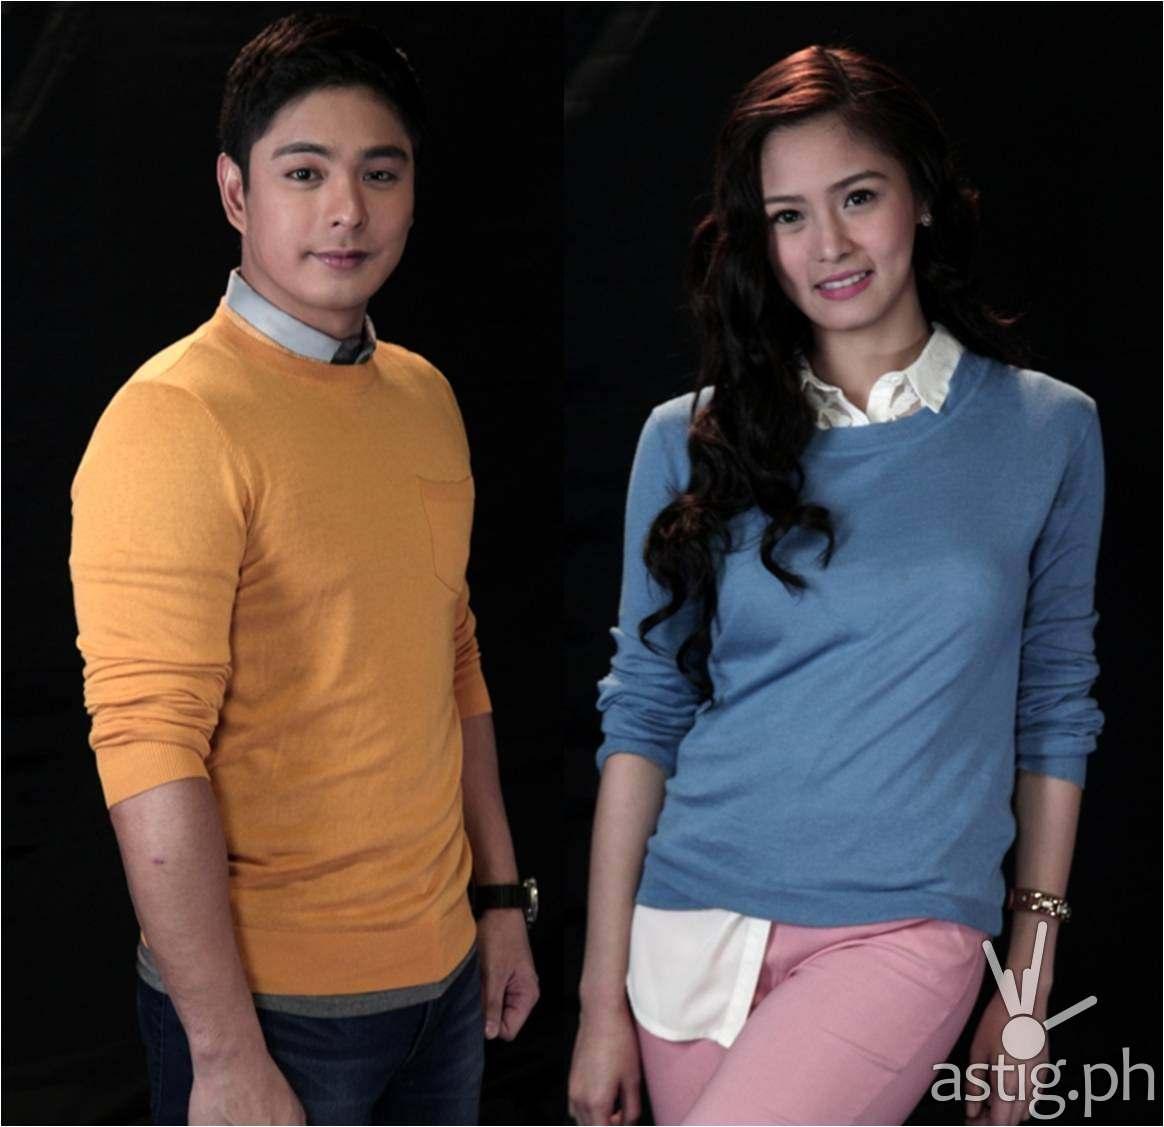 Coco Martin and Kim Chiu as Gabriel and Andrea in Ikaw Lamang